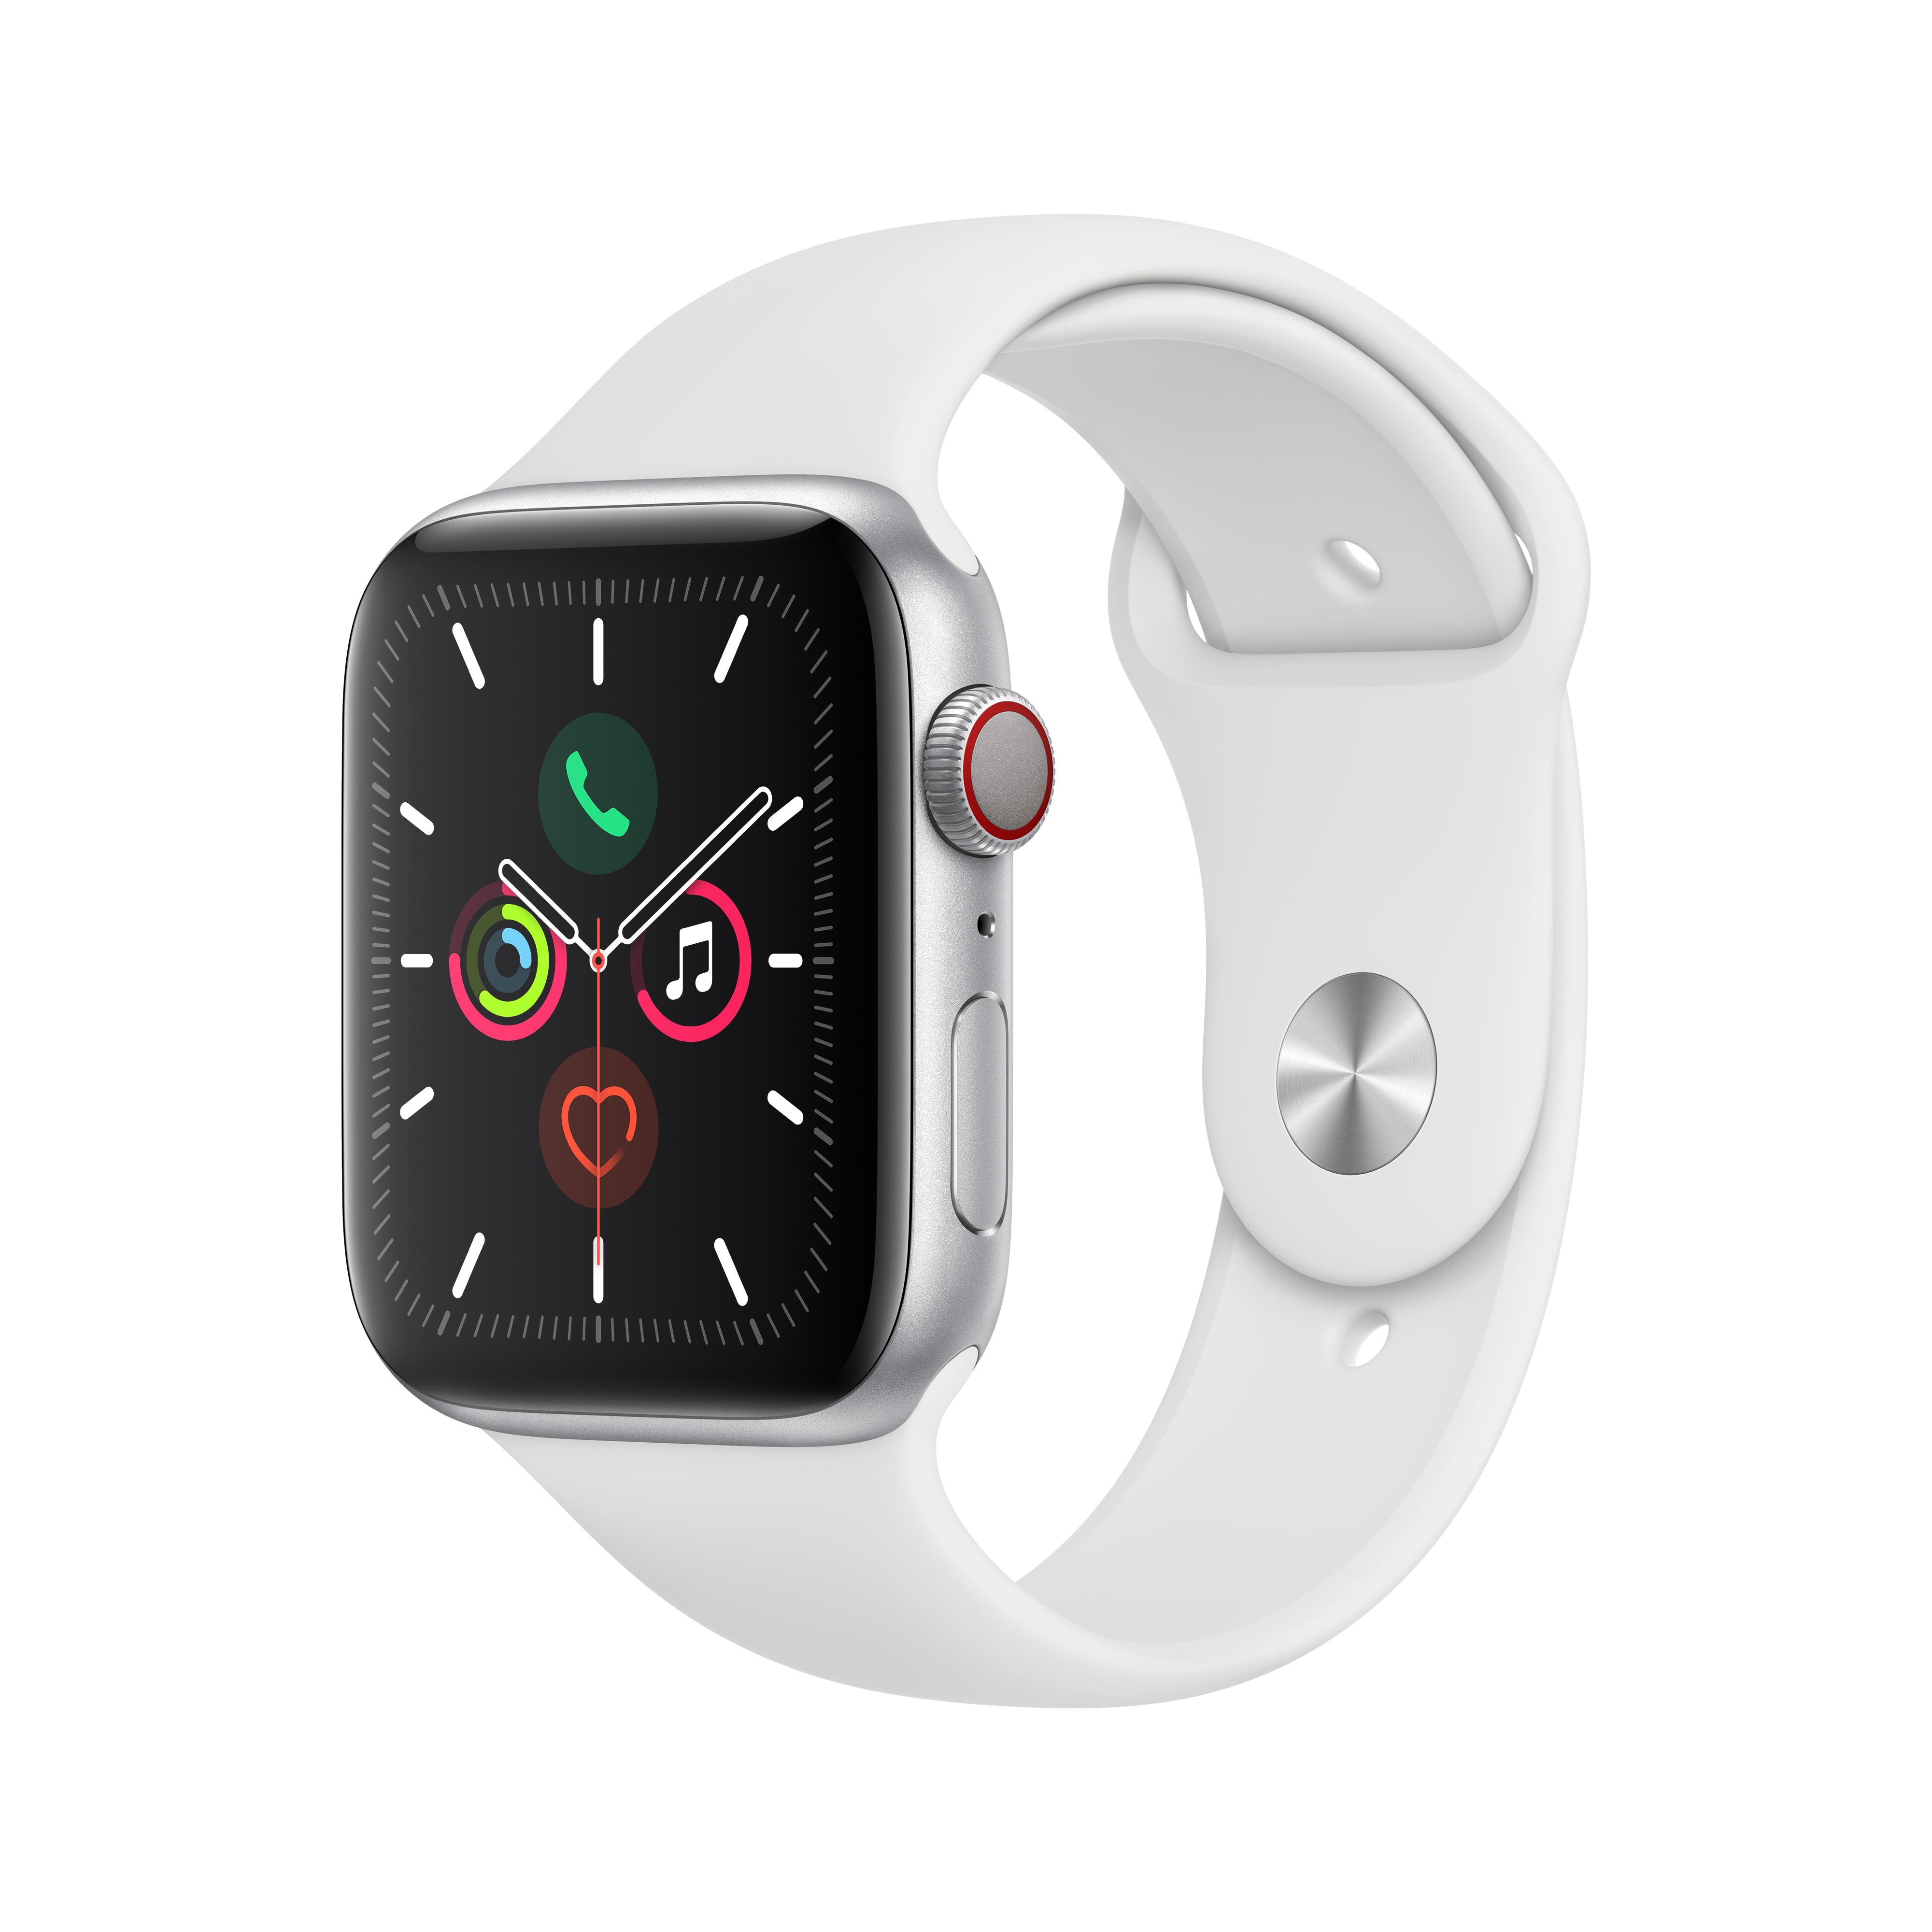 Apple 애플워치5 GPS + 셀룰러 44mm 스포츠밴드 + 알루미늄케이스, 실버(MWWC2KH/A), 화이트(밴드)